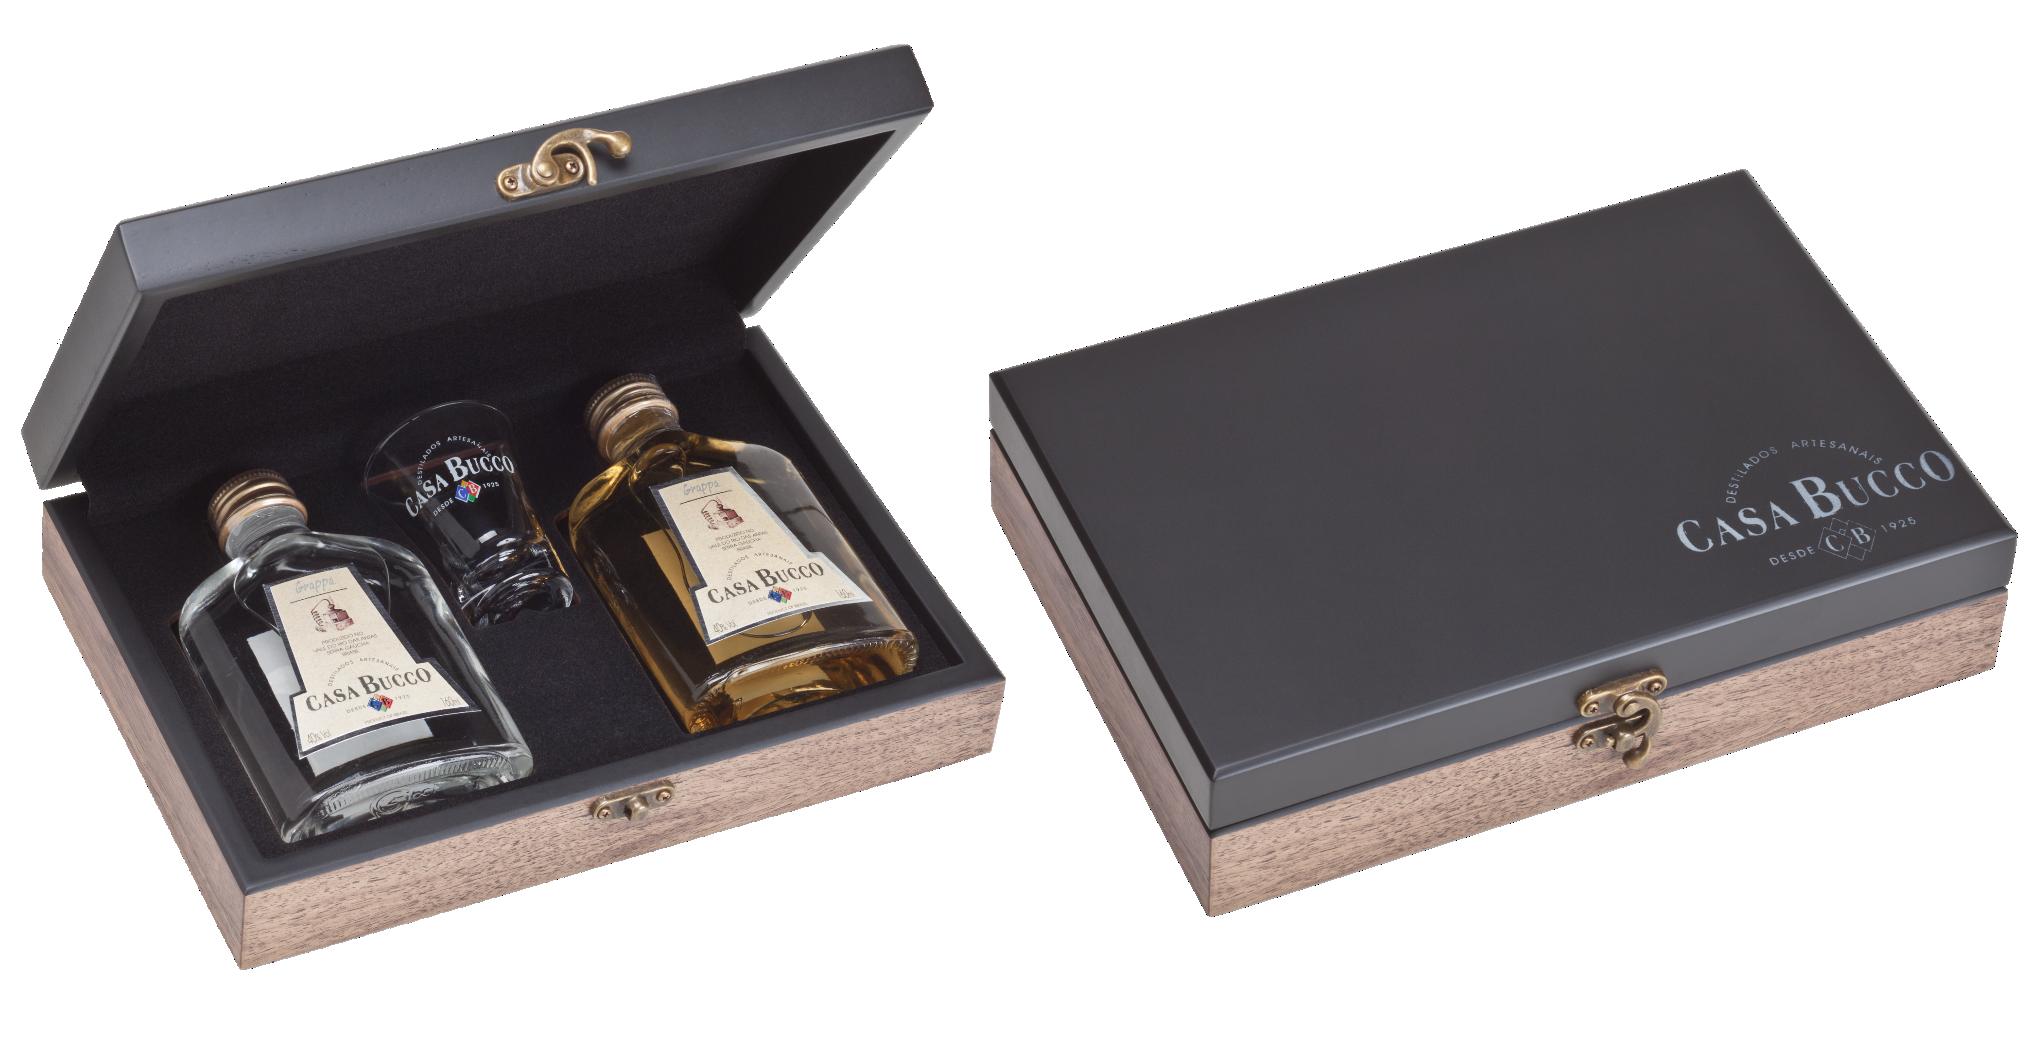 RJ 102   Kits   Casa Bucco - Destilados Artesanais